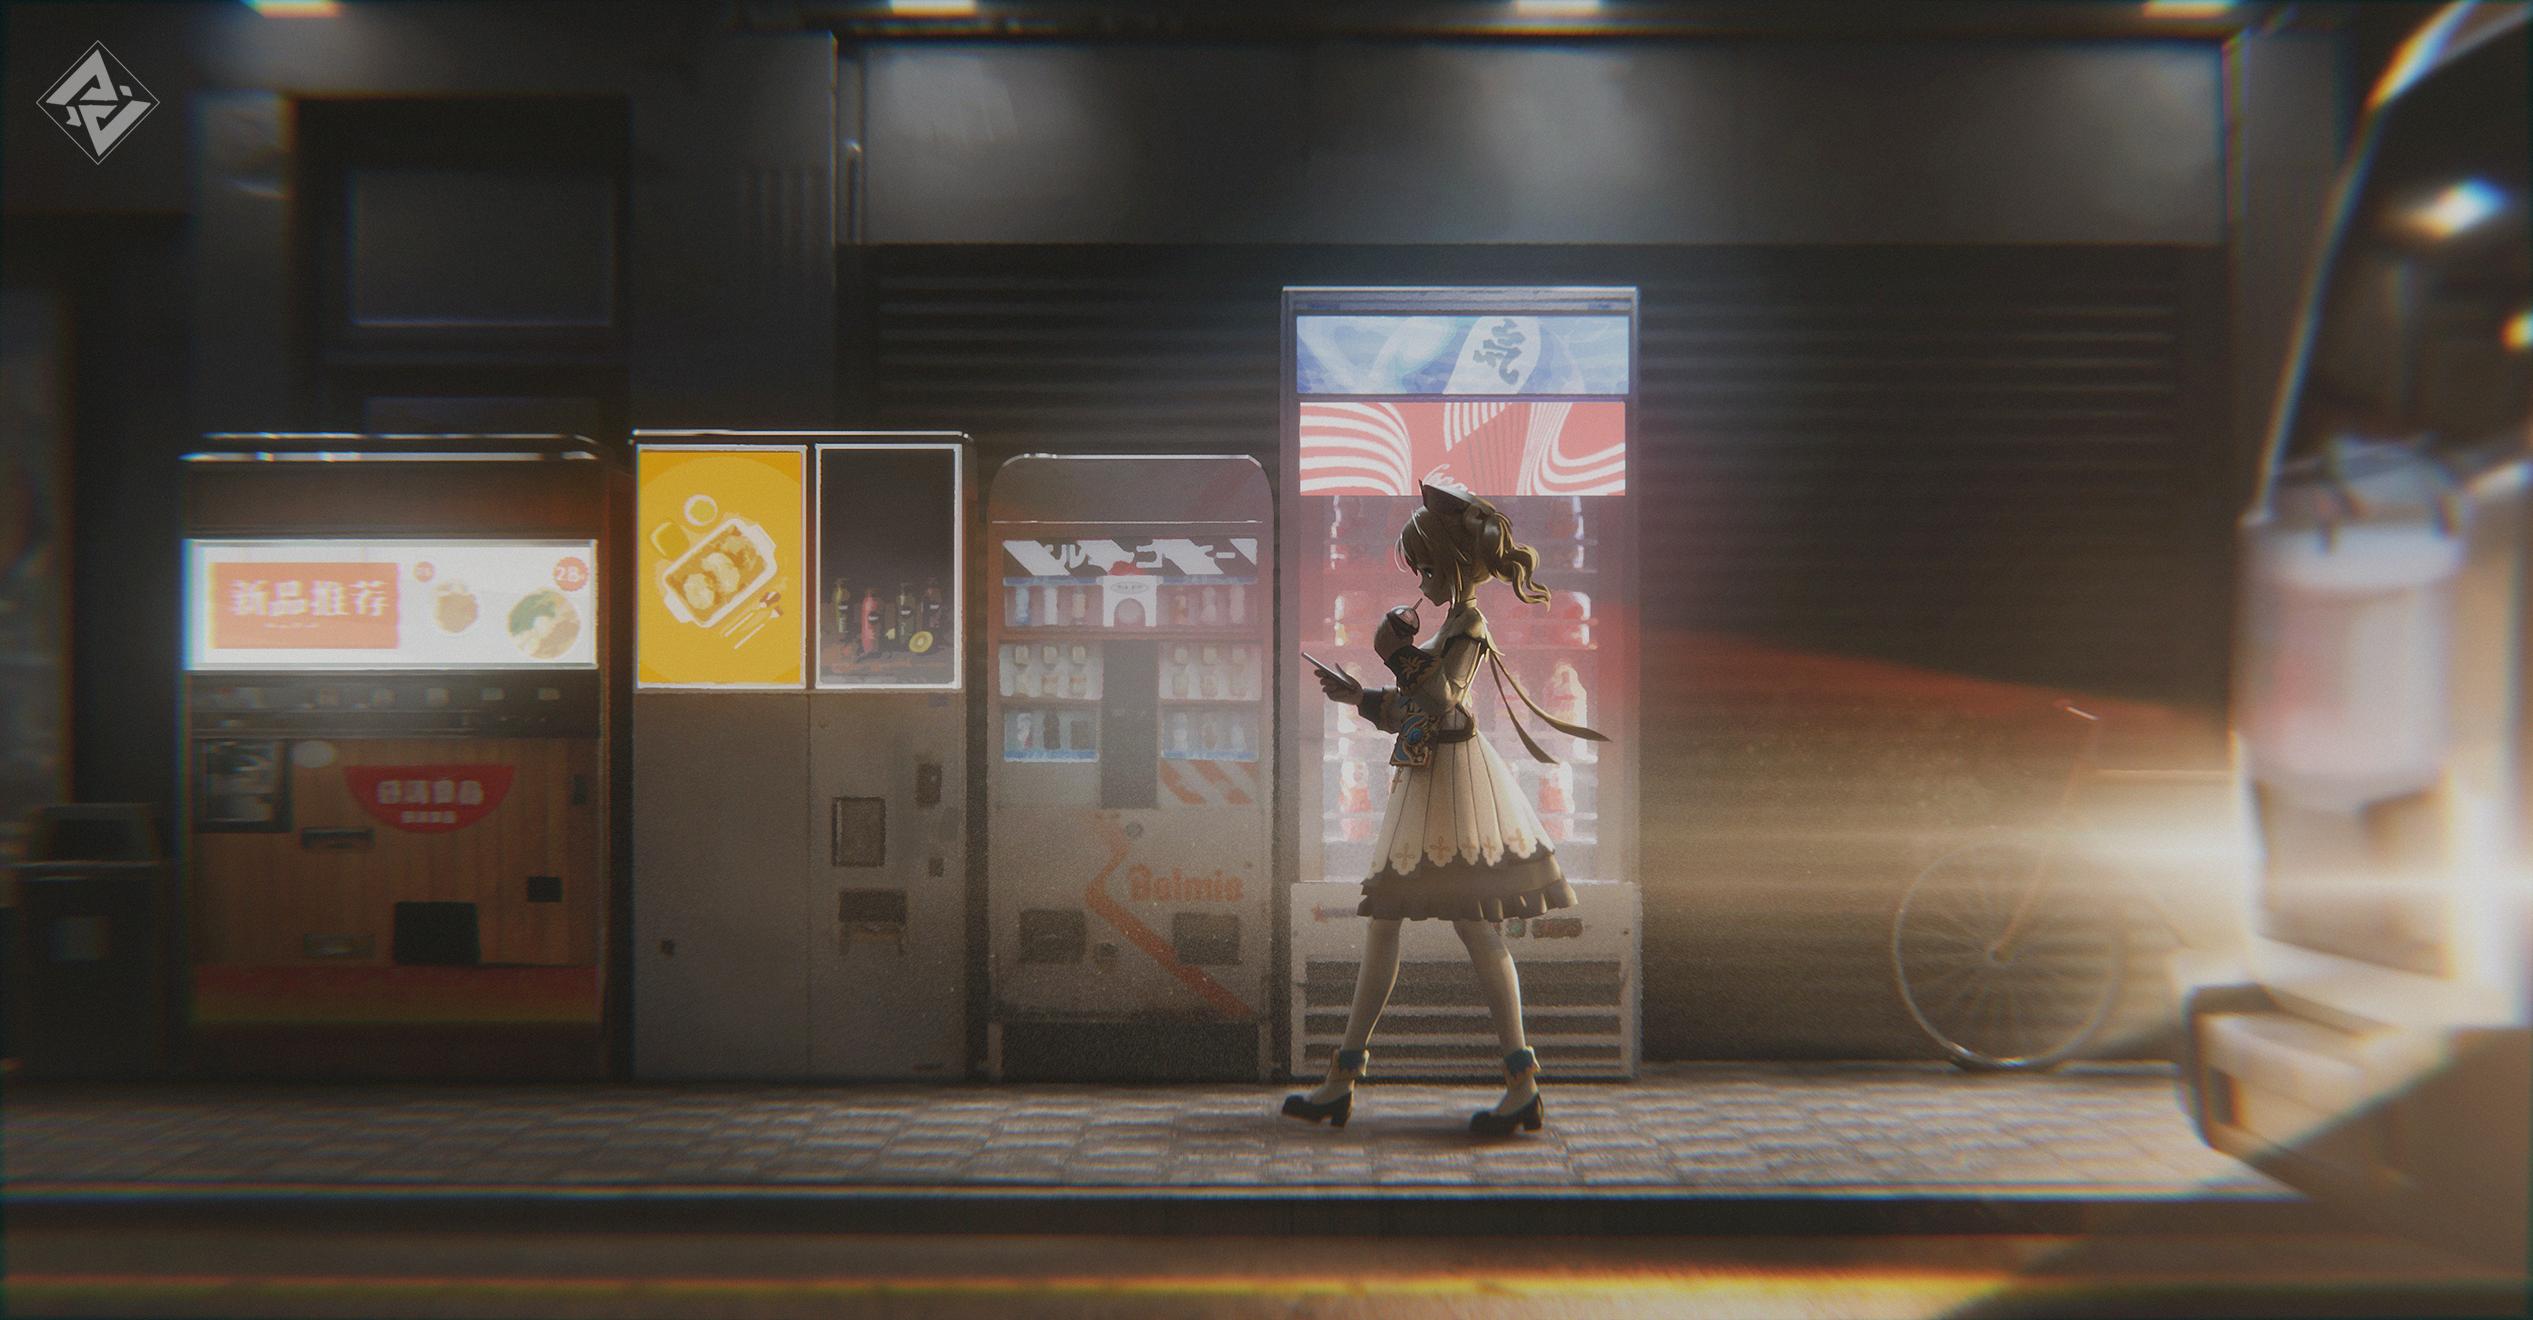 Anime 2533x1320 artwork digital art Genshin Impact barbara (genshin impact) video game characters street night light effects anime girls